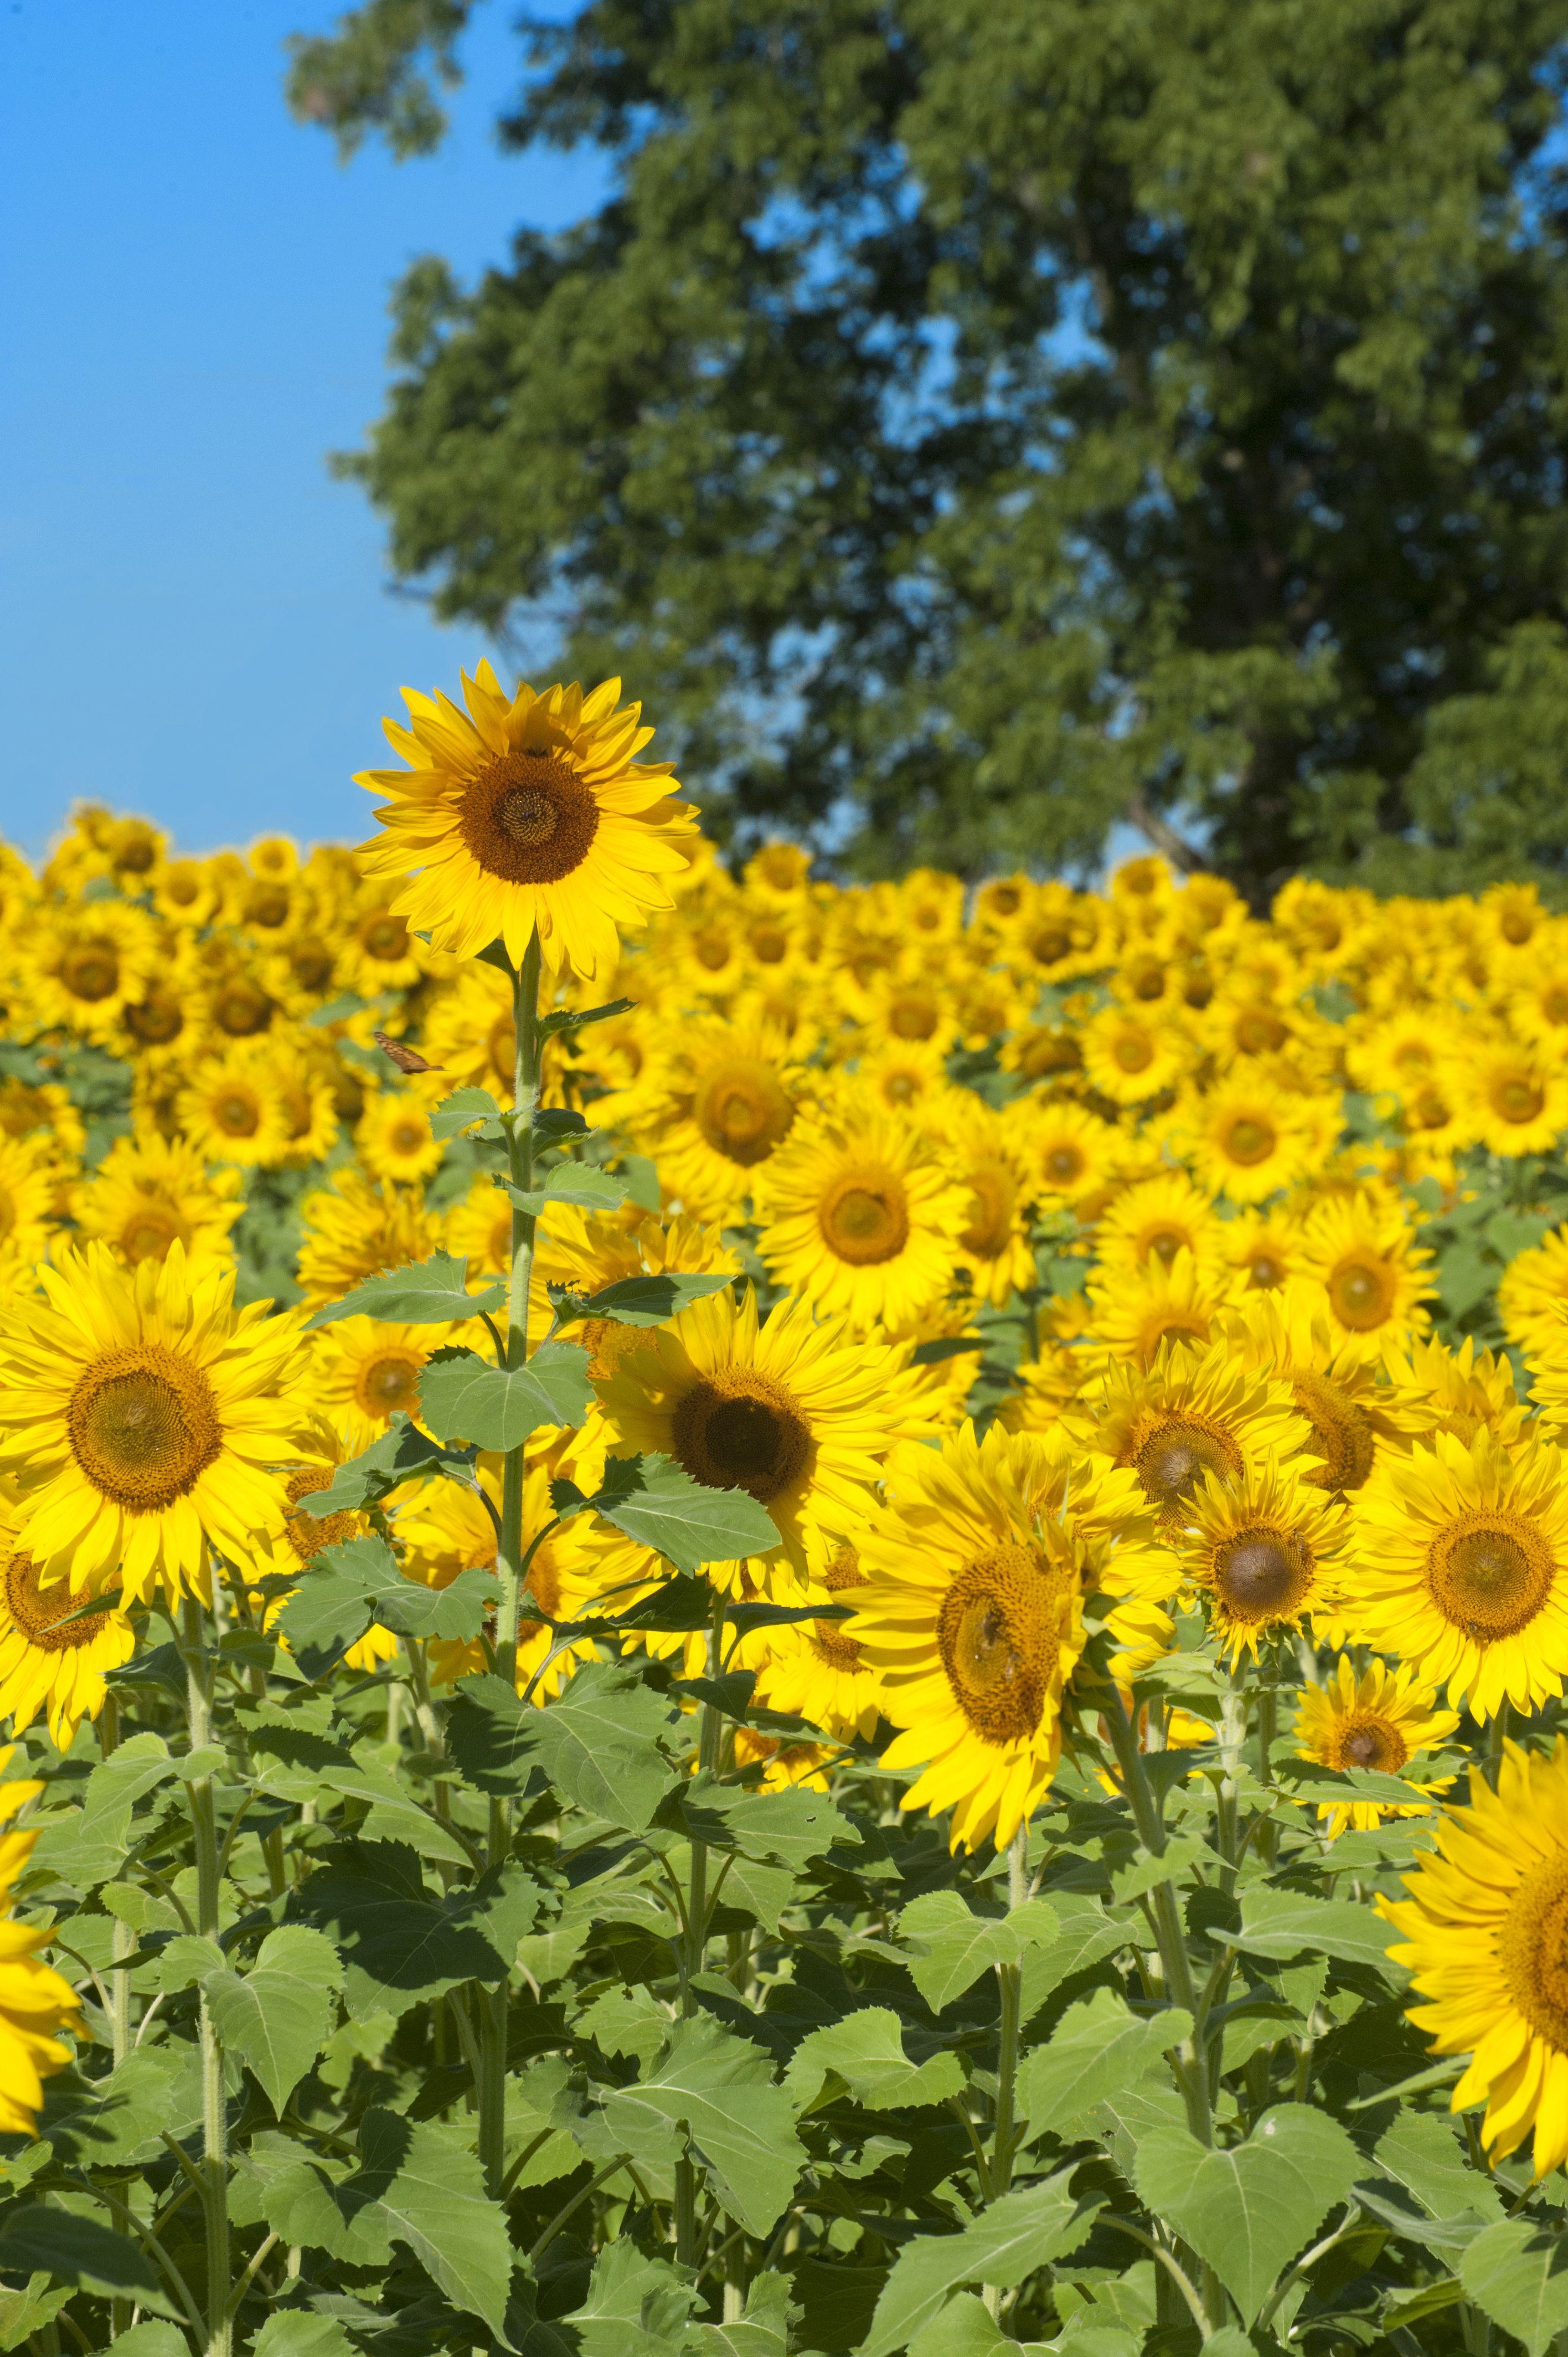 Sunflower field near Raleigh sunflowers flowers nature photography Raleigh Sharkshock visitraleigh